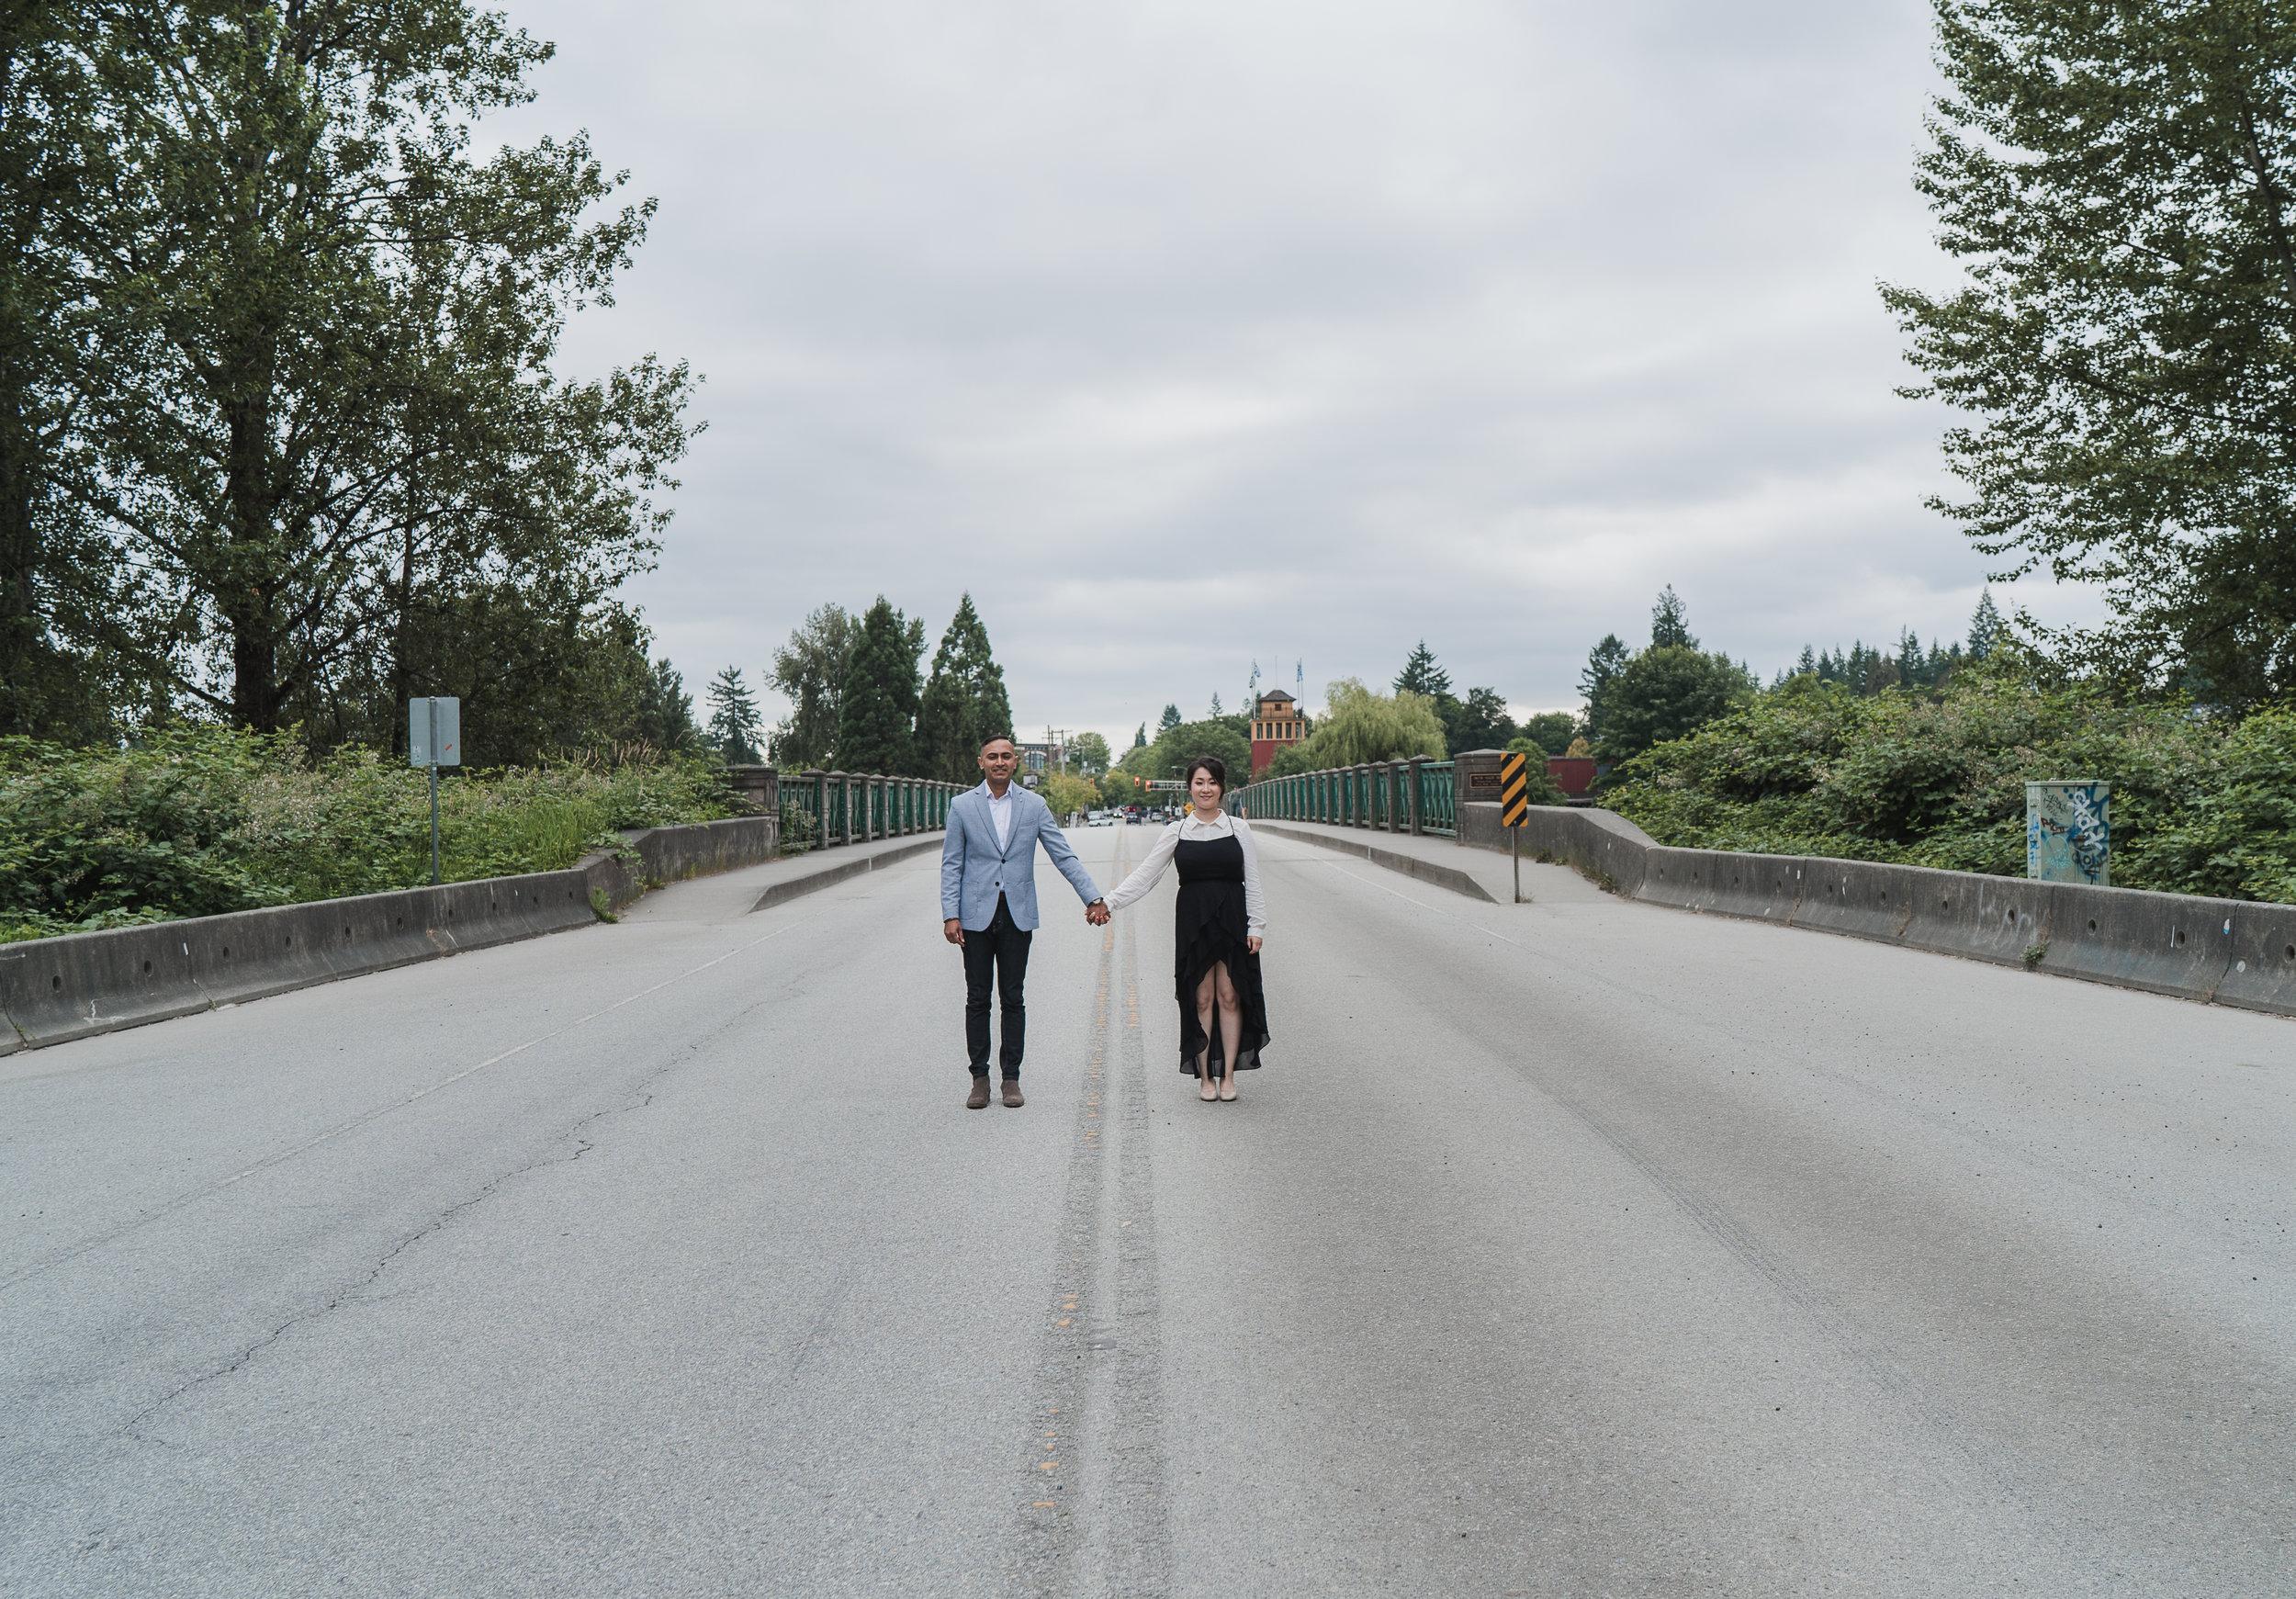 20190622 - Monika & Johnson Engagement- 0068.jpg